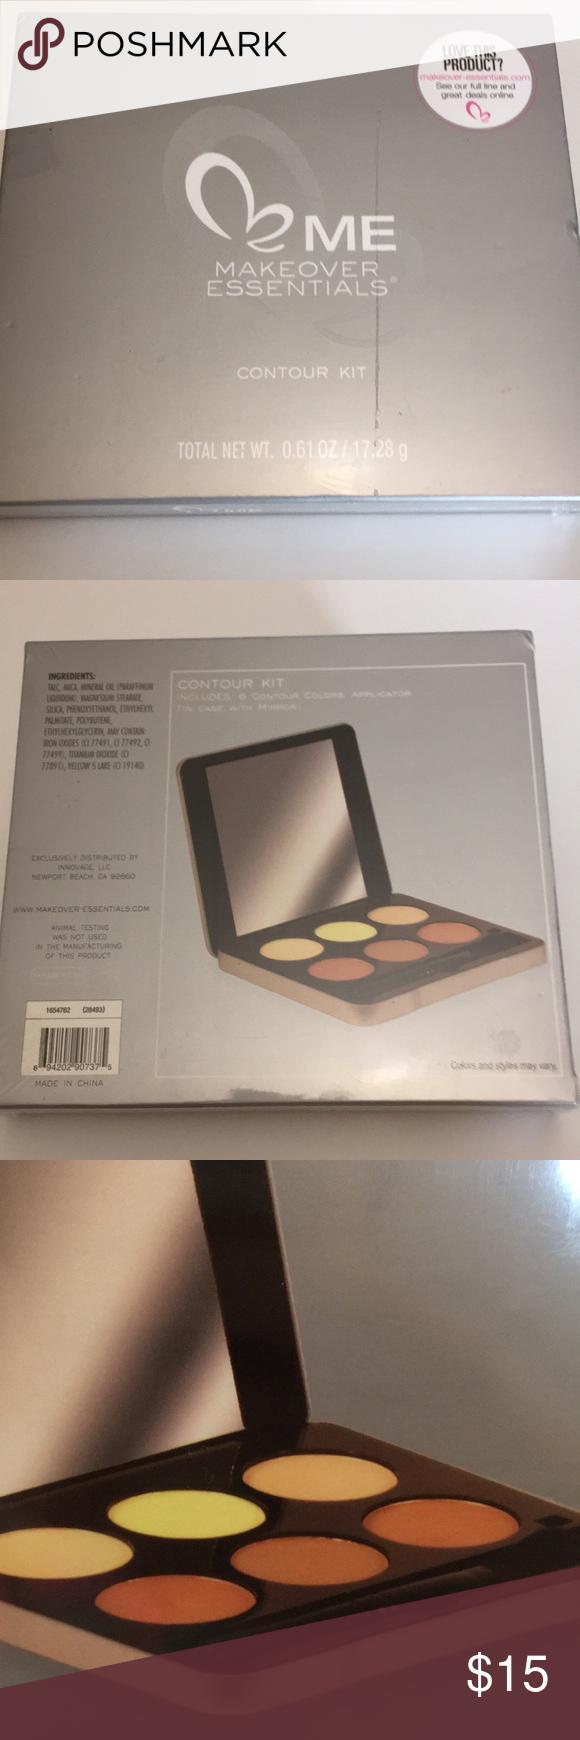 ME makeup essentials contour kit Makeup essentials